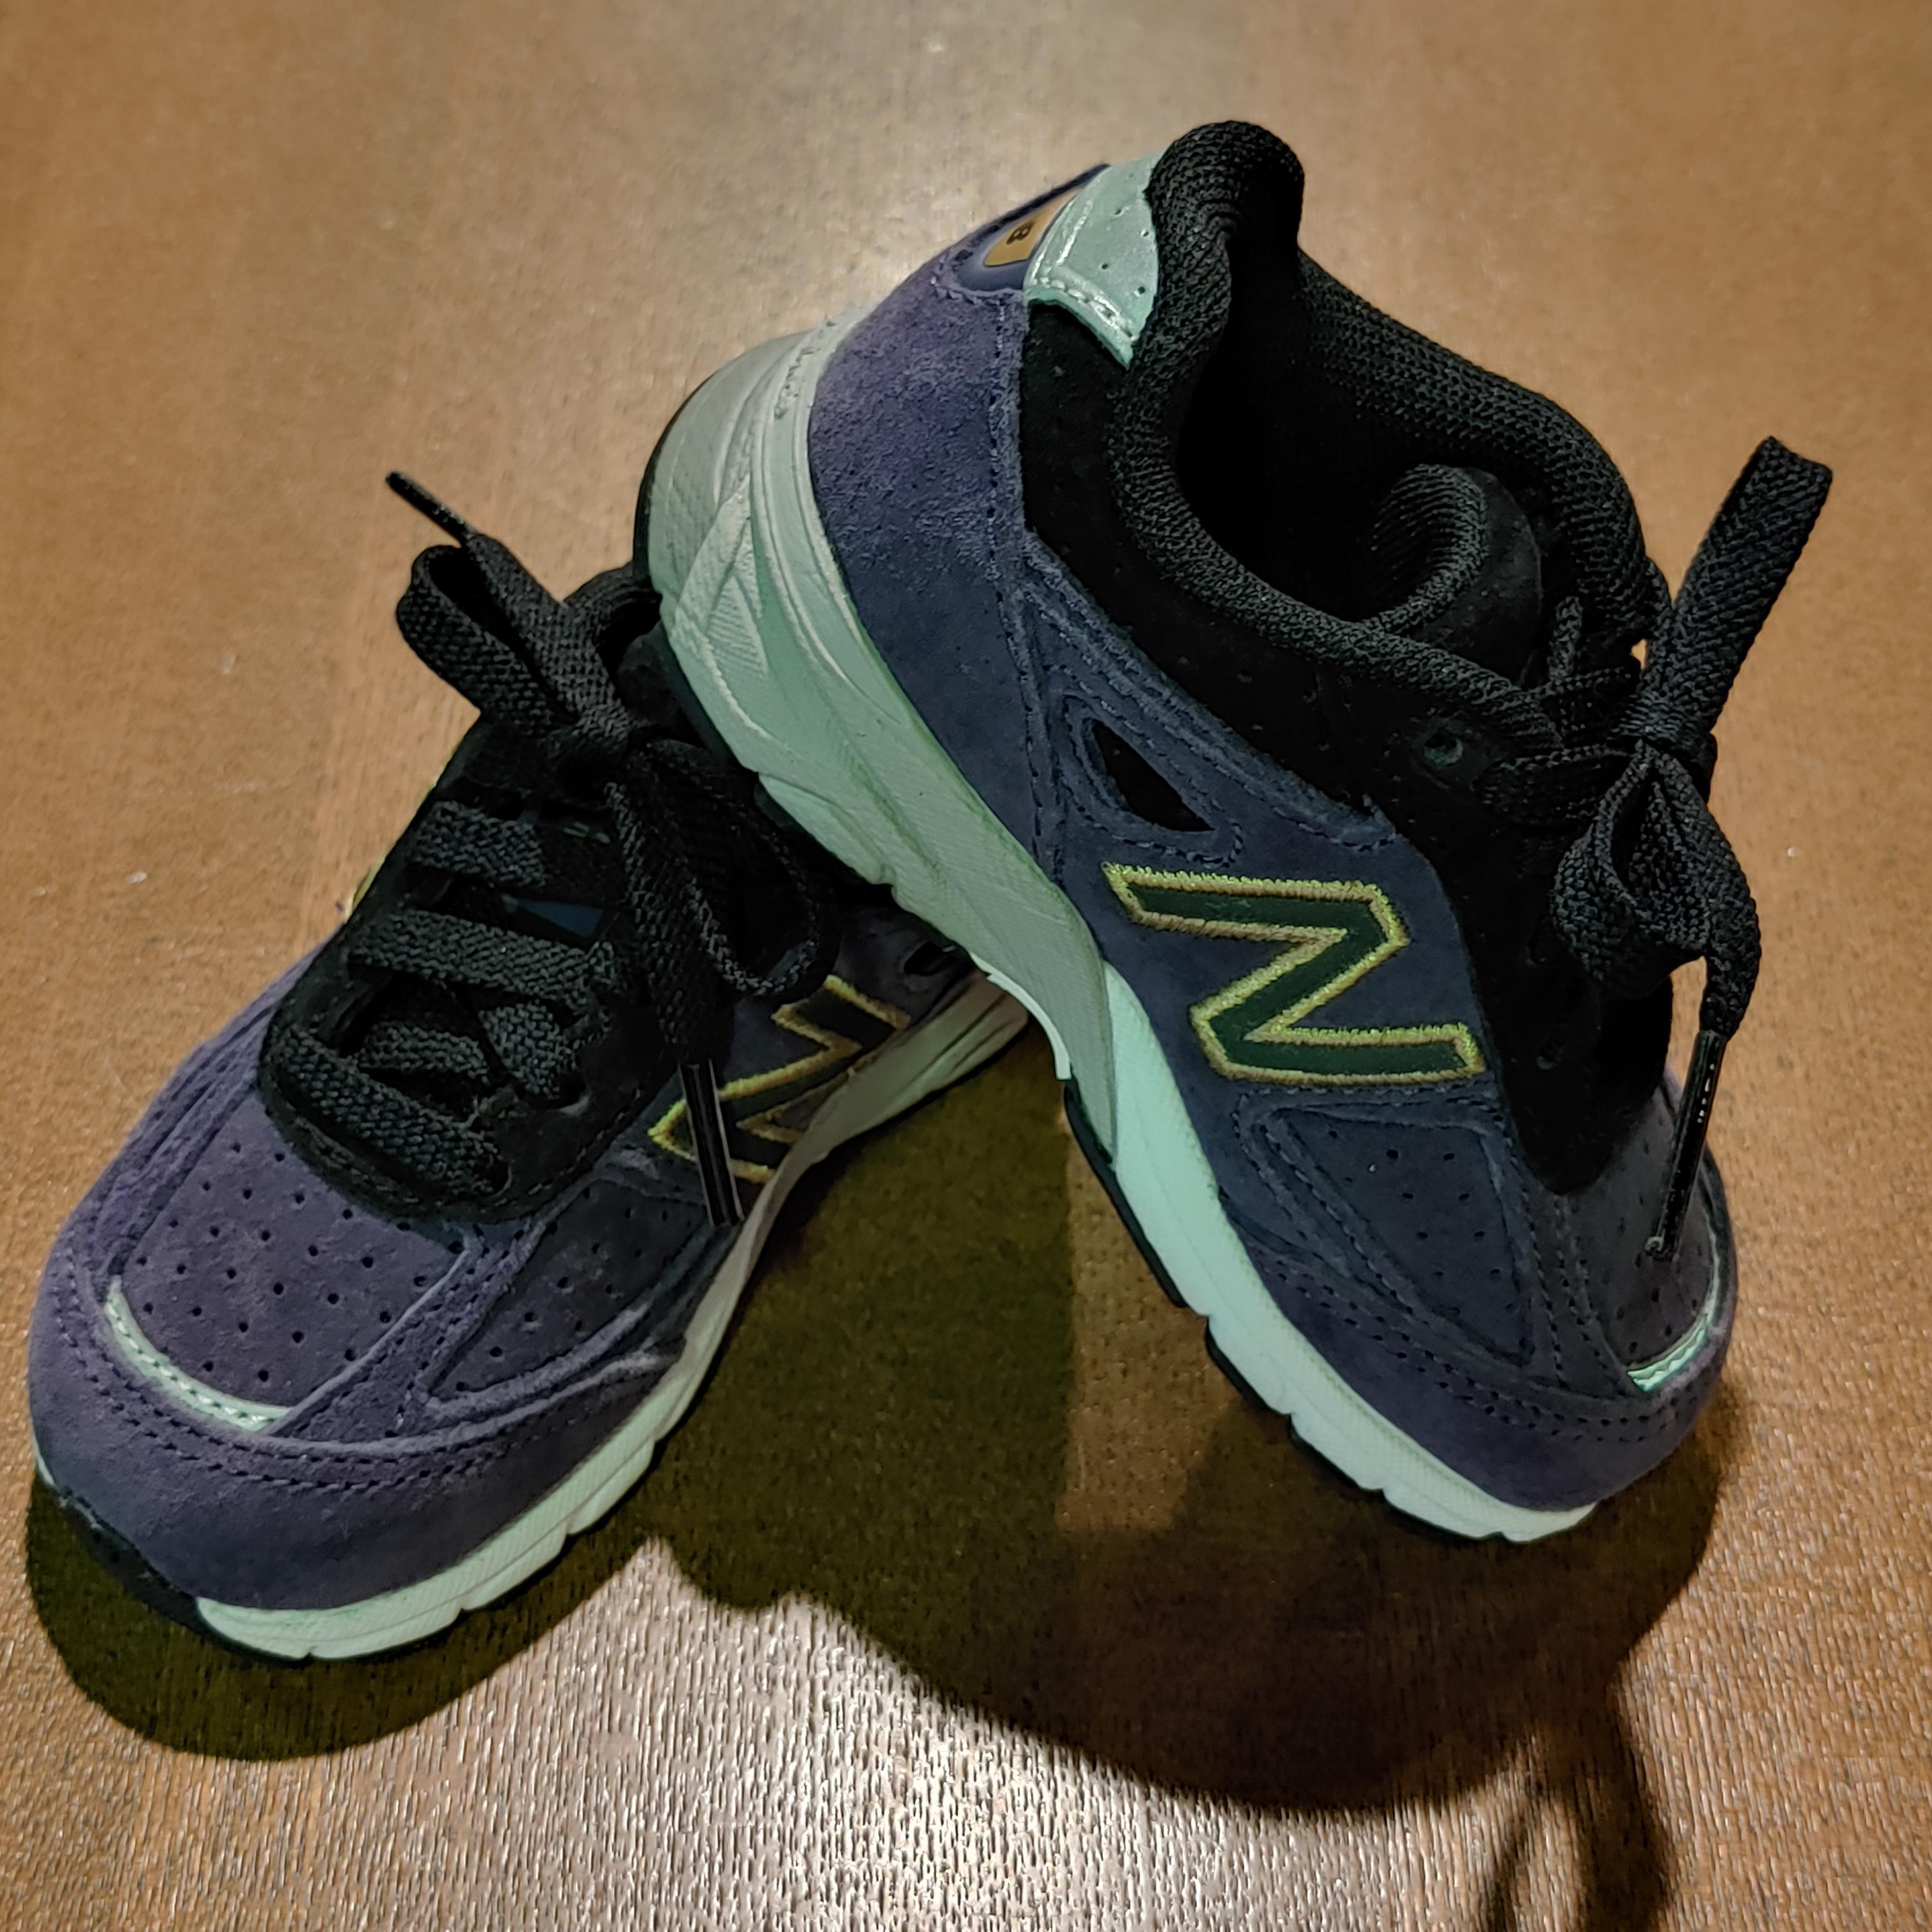 【BABY】New Balance US5.5(12cm)